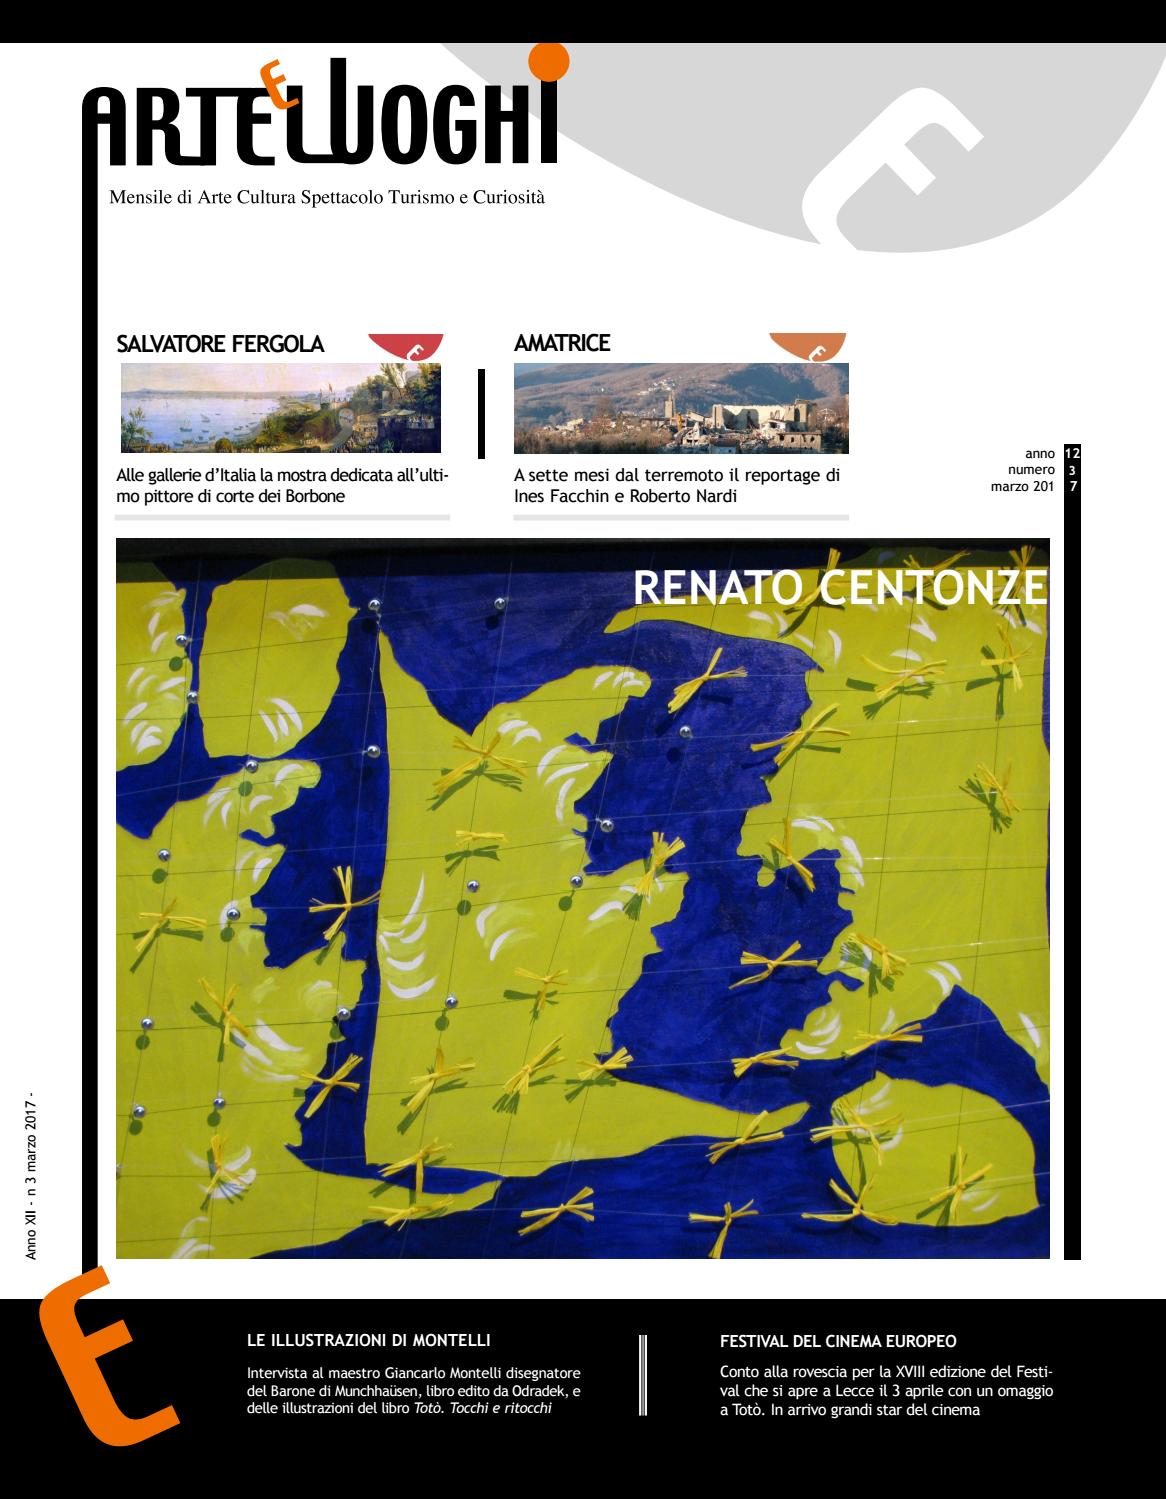 Arte e luoghi marzo2017 by arteeluoghi - issuu 1b985d6aa70